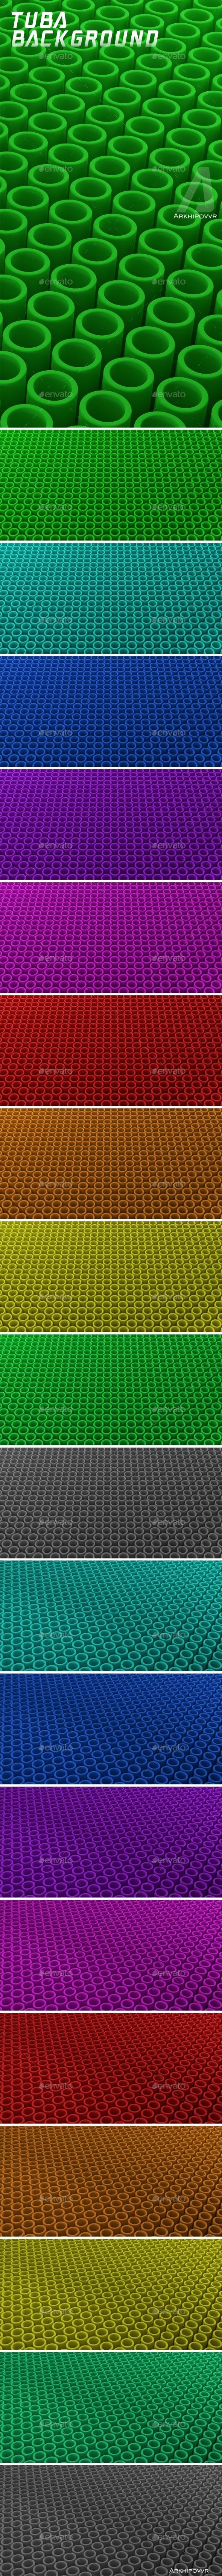 Tuba Backgrounds - 3D Backgrounds